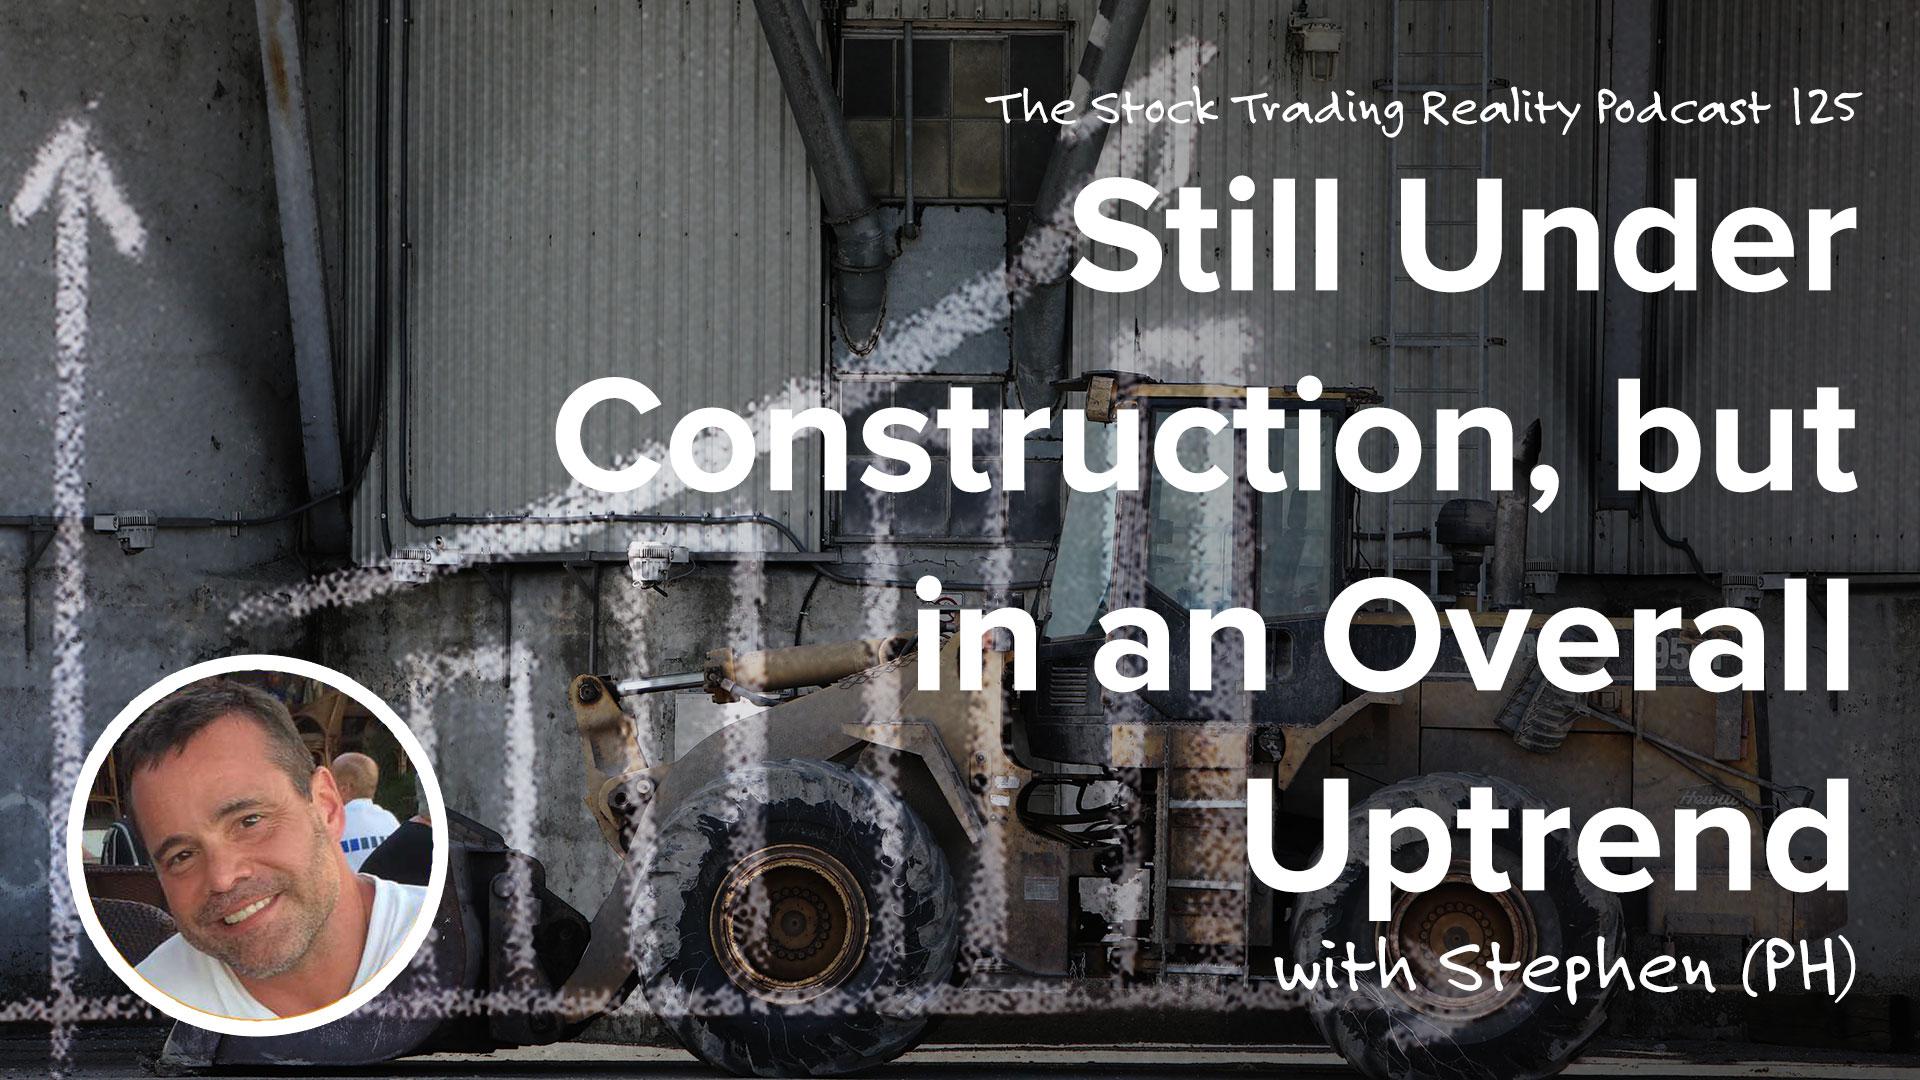 STR 125: Still Under Construction, but in an Overall Uptrend